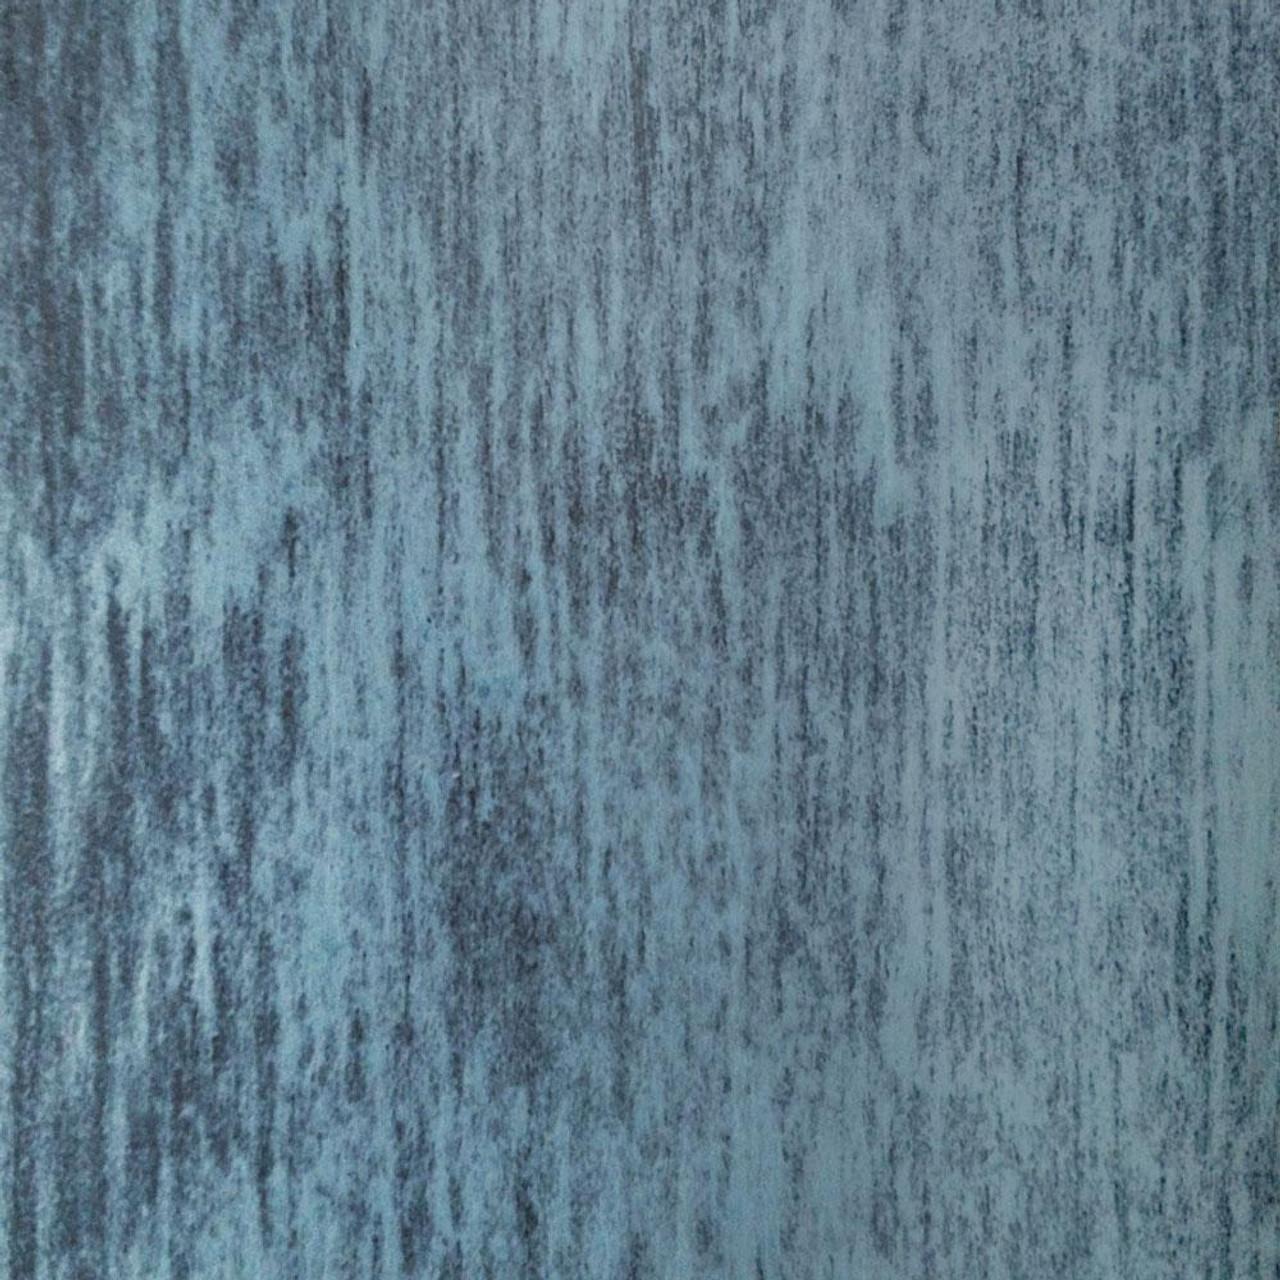 Modern Masters Metal Effects Oxidizing Blue Patina Finish Kit 2-Ounce